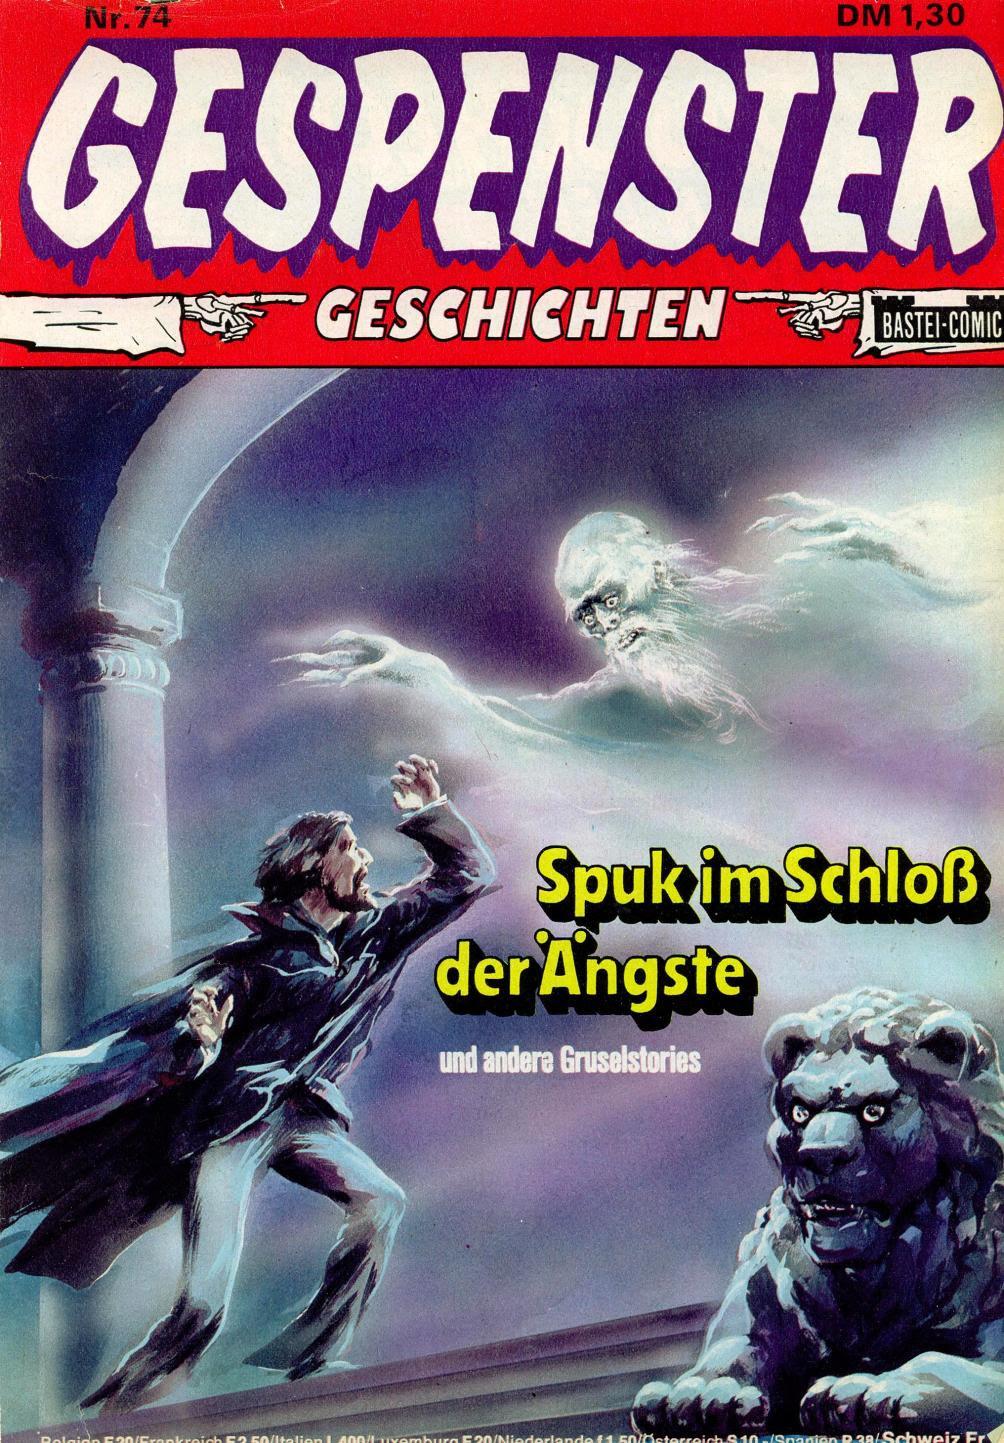 Gespenster Geschichten - 74